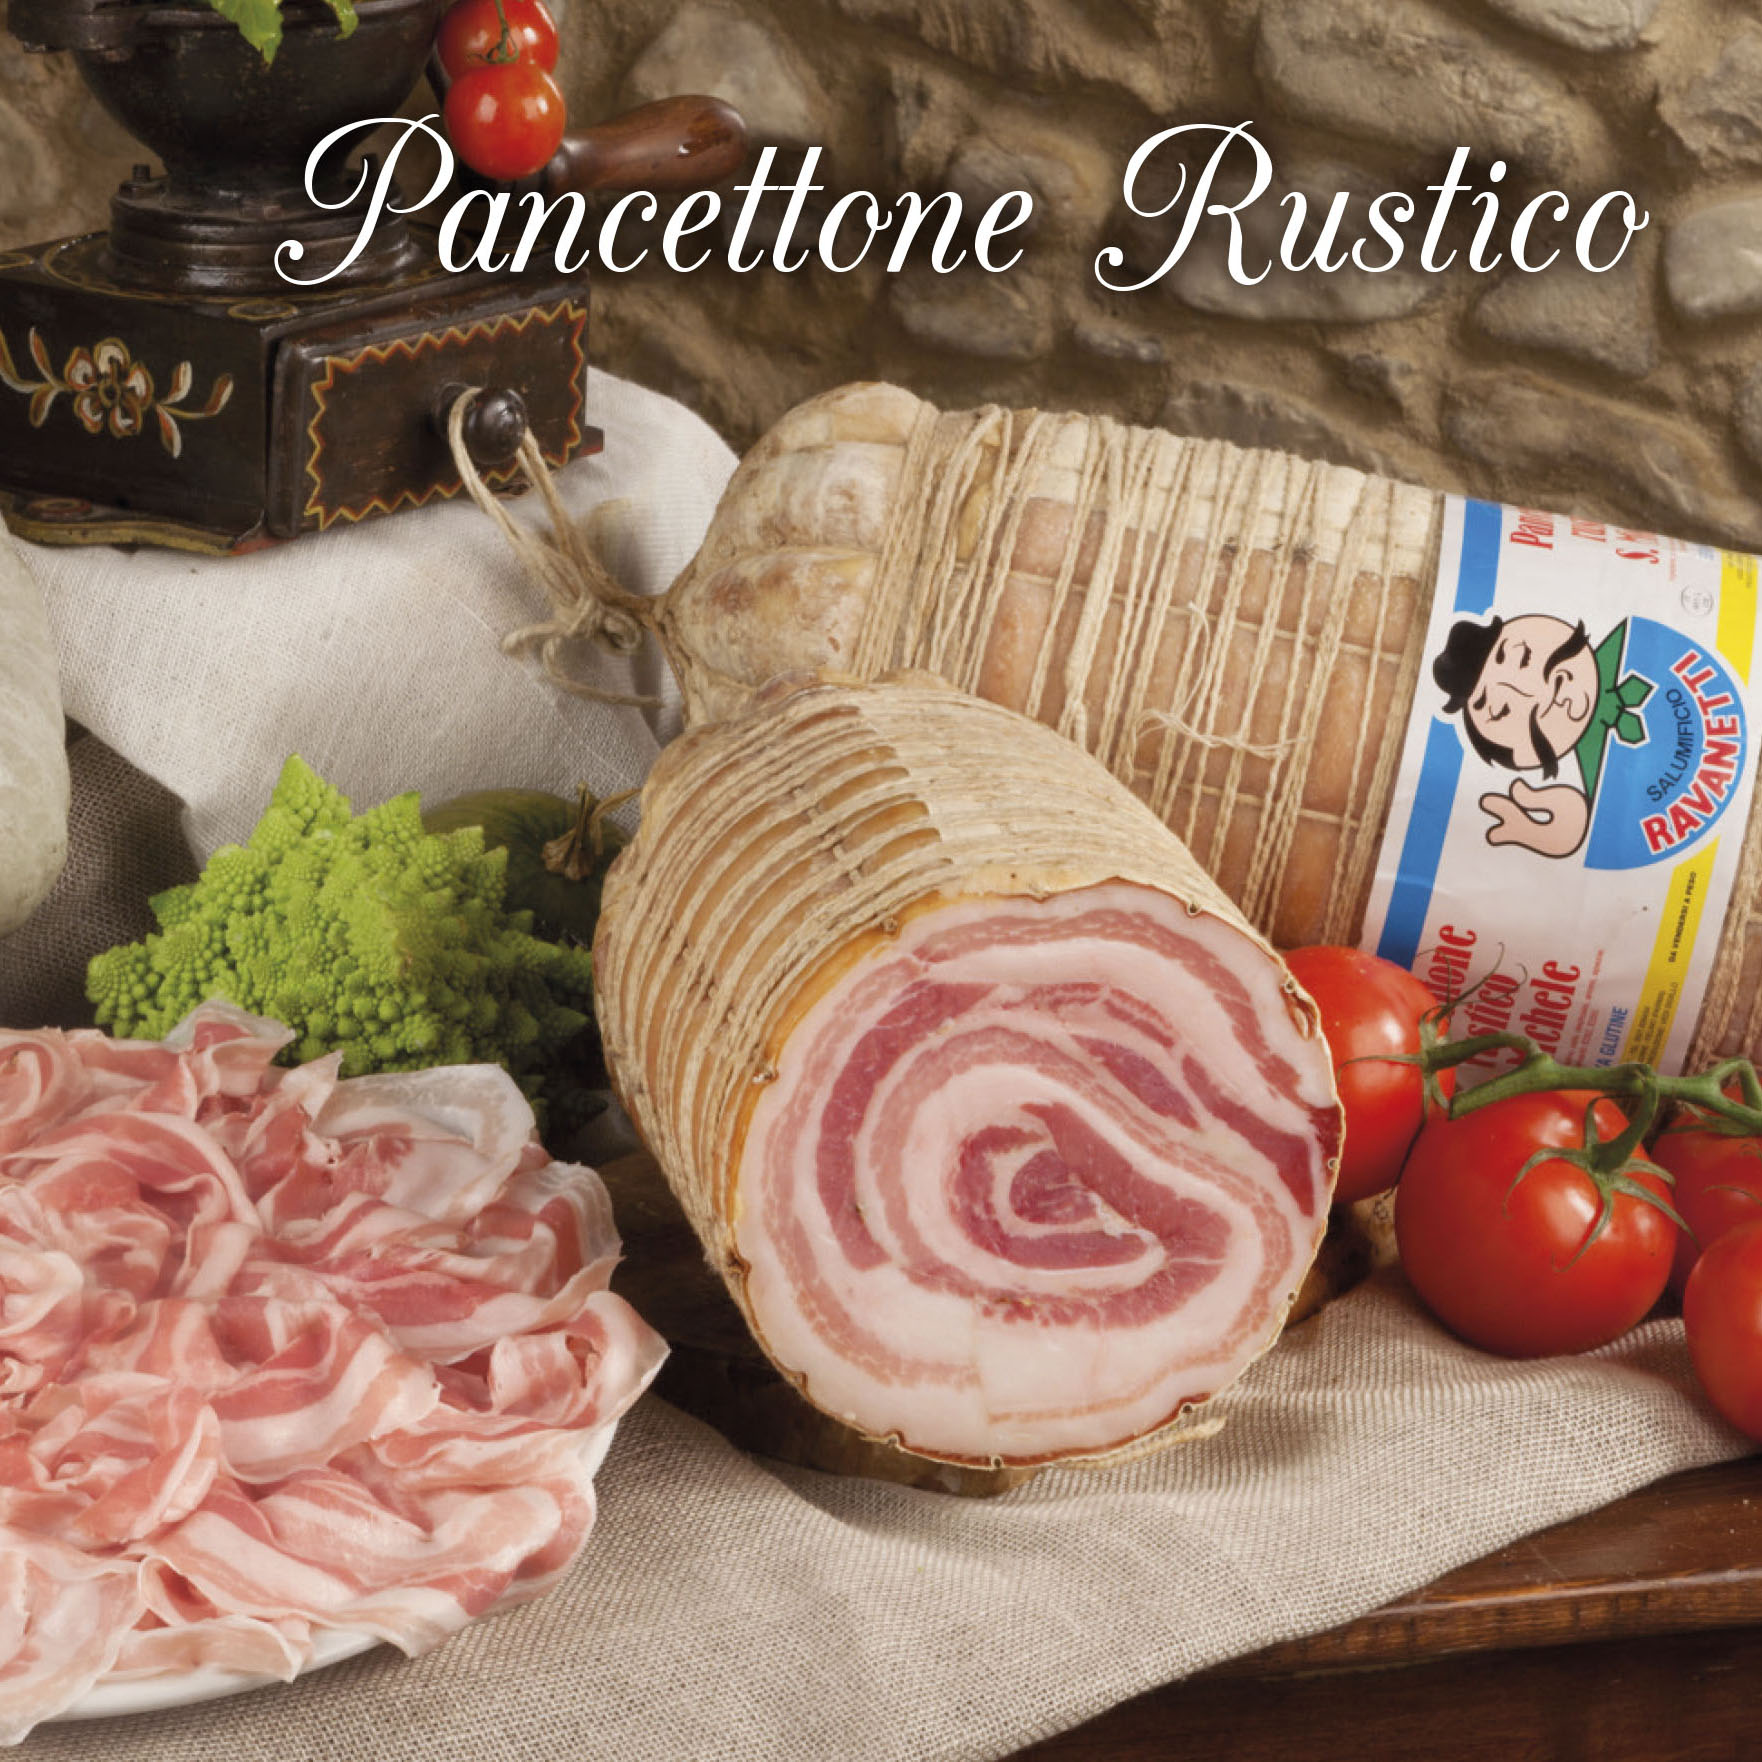 Pancettone Rustico